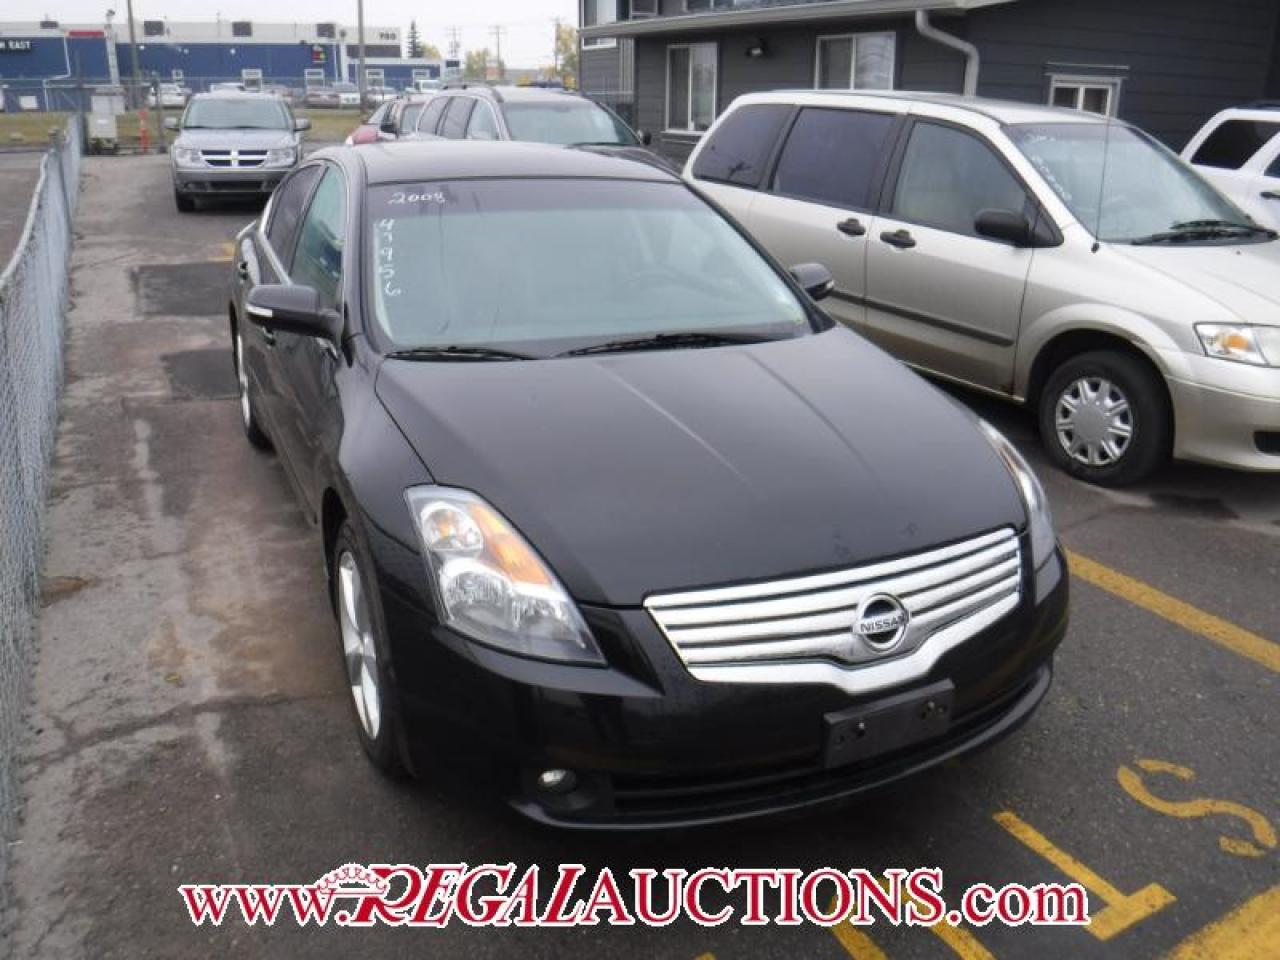 Photo of Black 2008 Nissan Altima